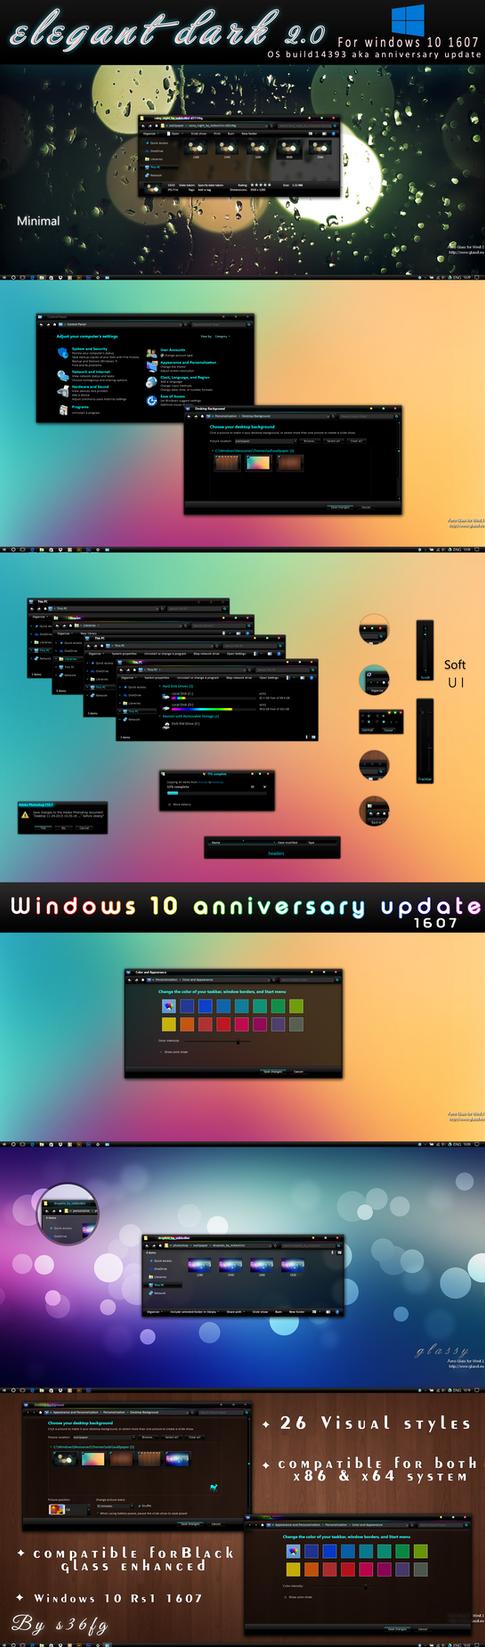 Elegant dark 2.0 theme for windows 10 (1607) by swapnil36fg